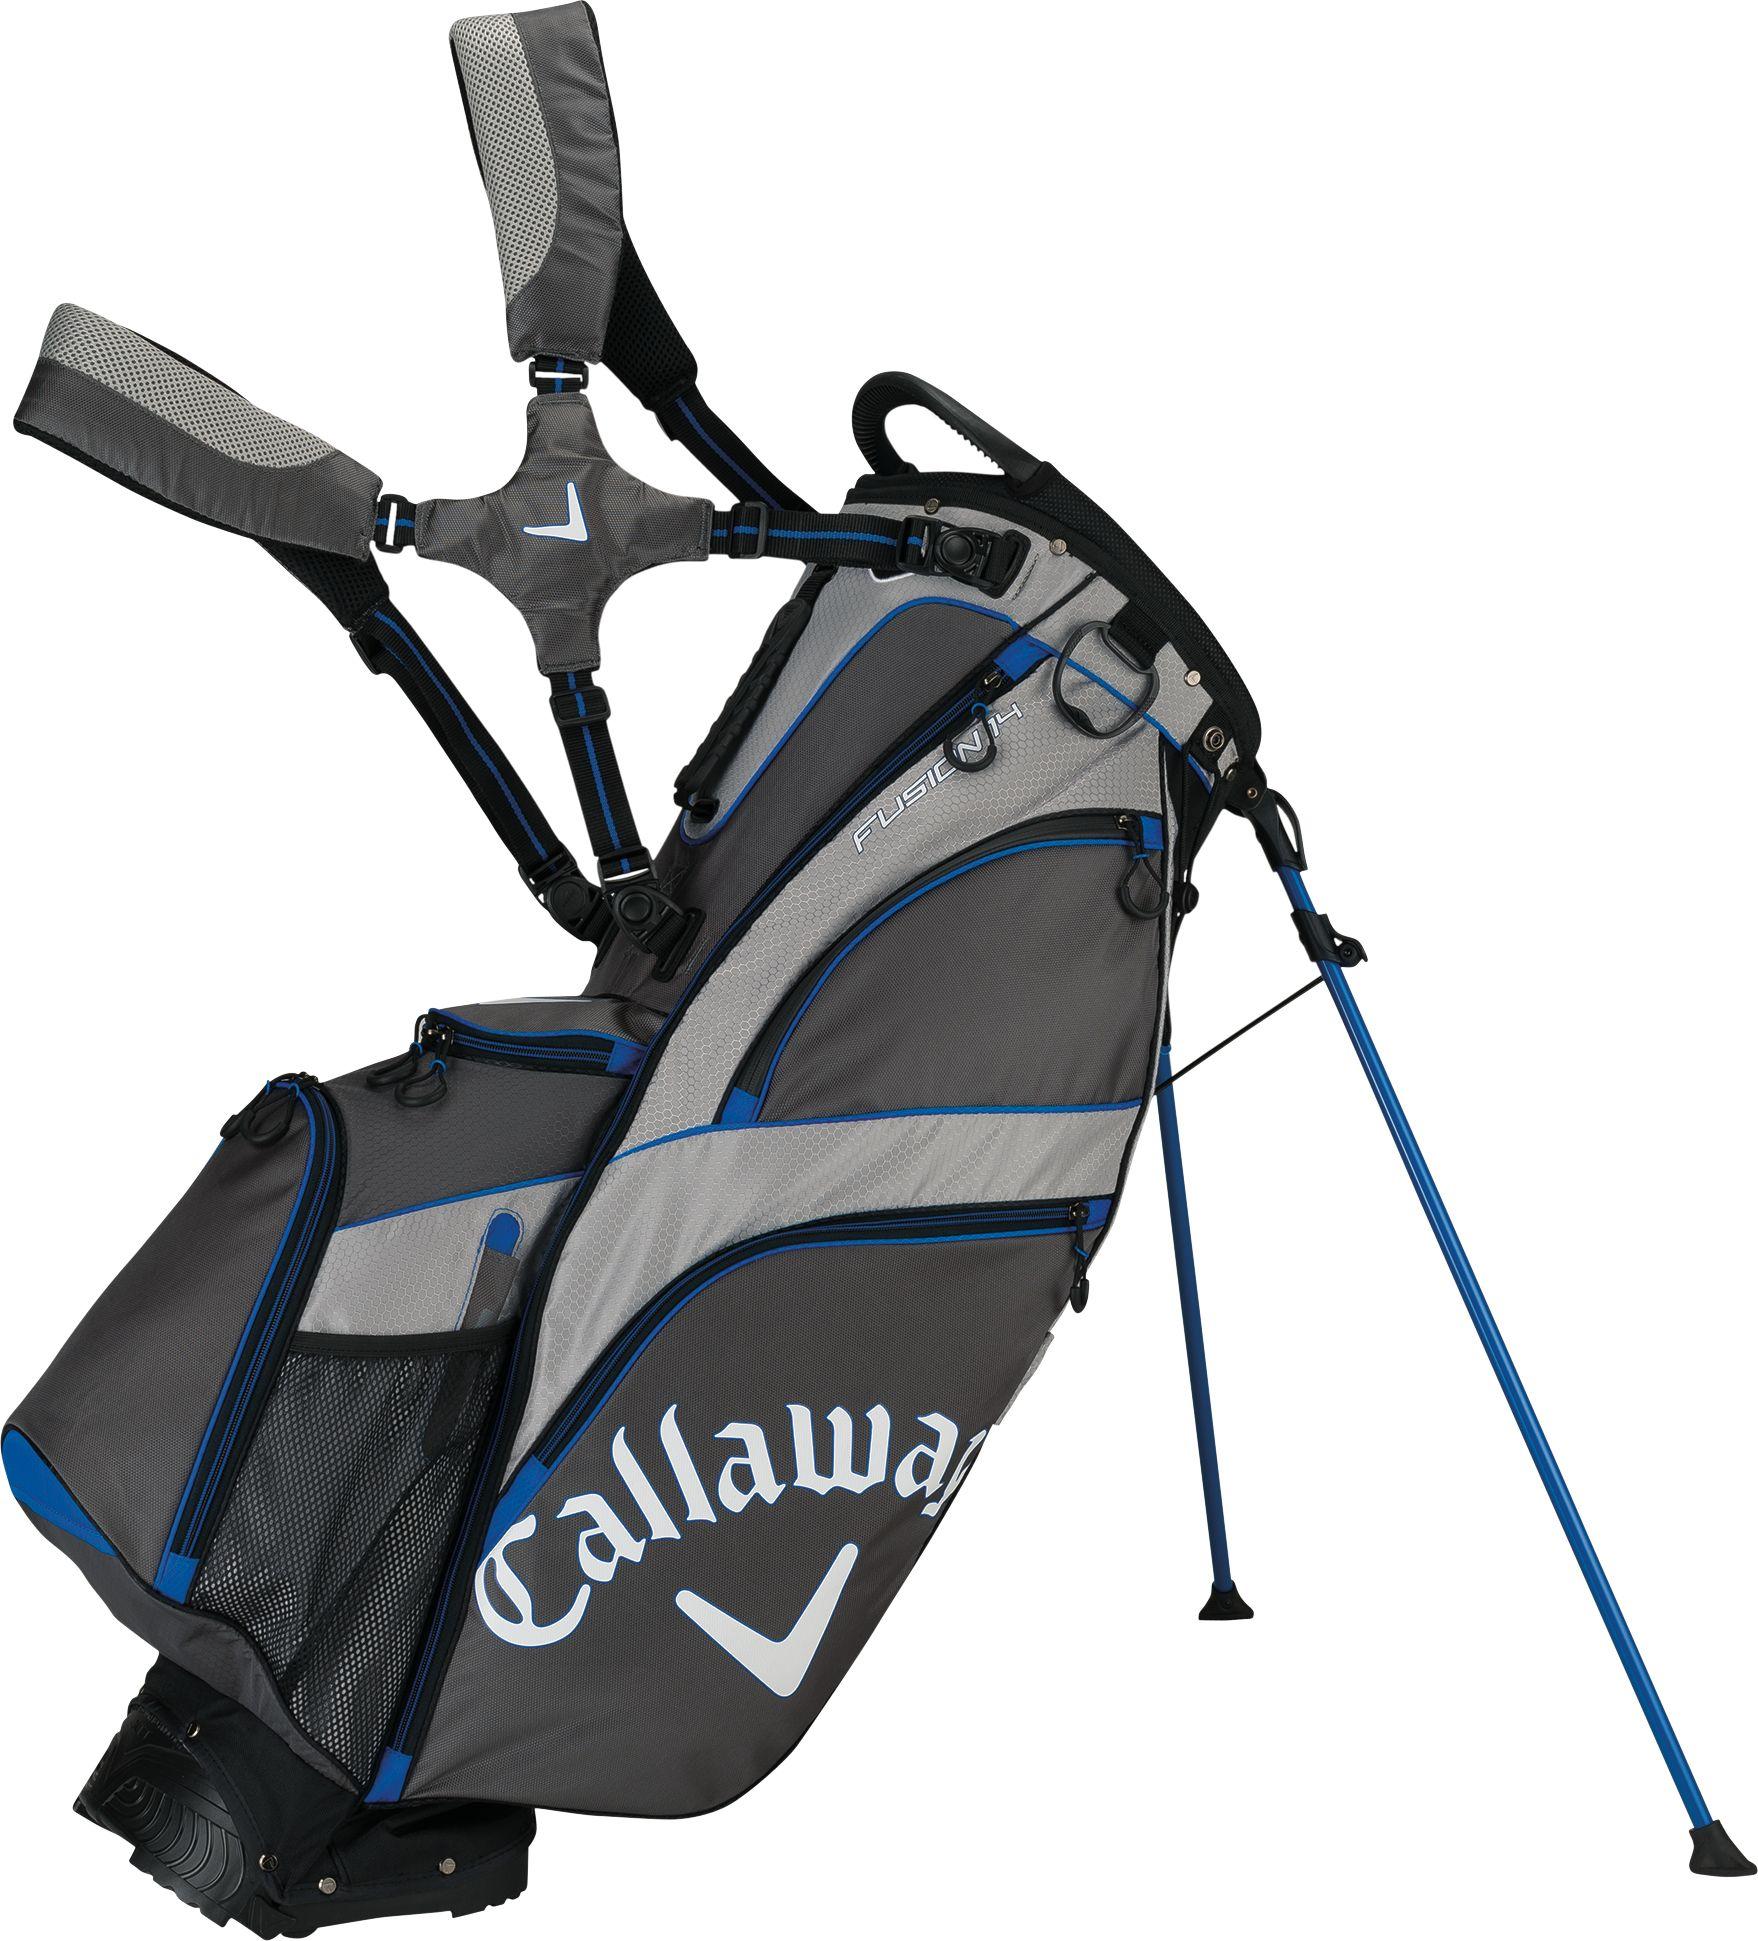 Callaway golf CW Fusion 14 stand bag šedo/stříbrno/ modrý